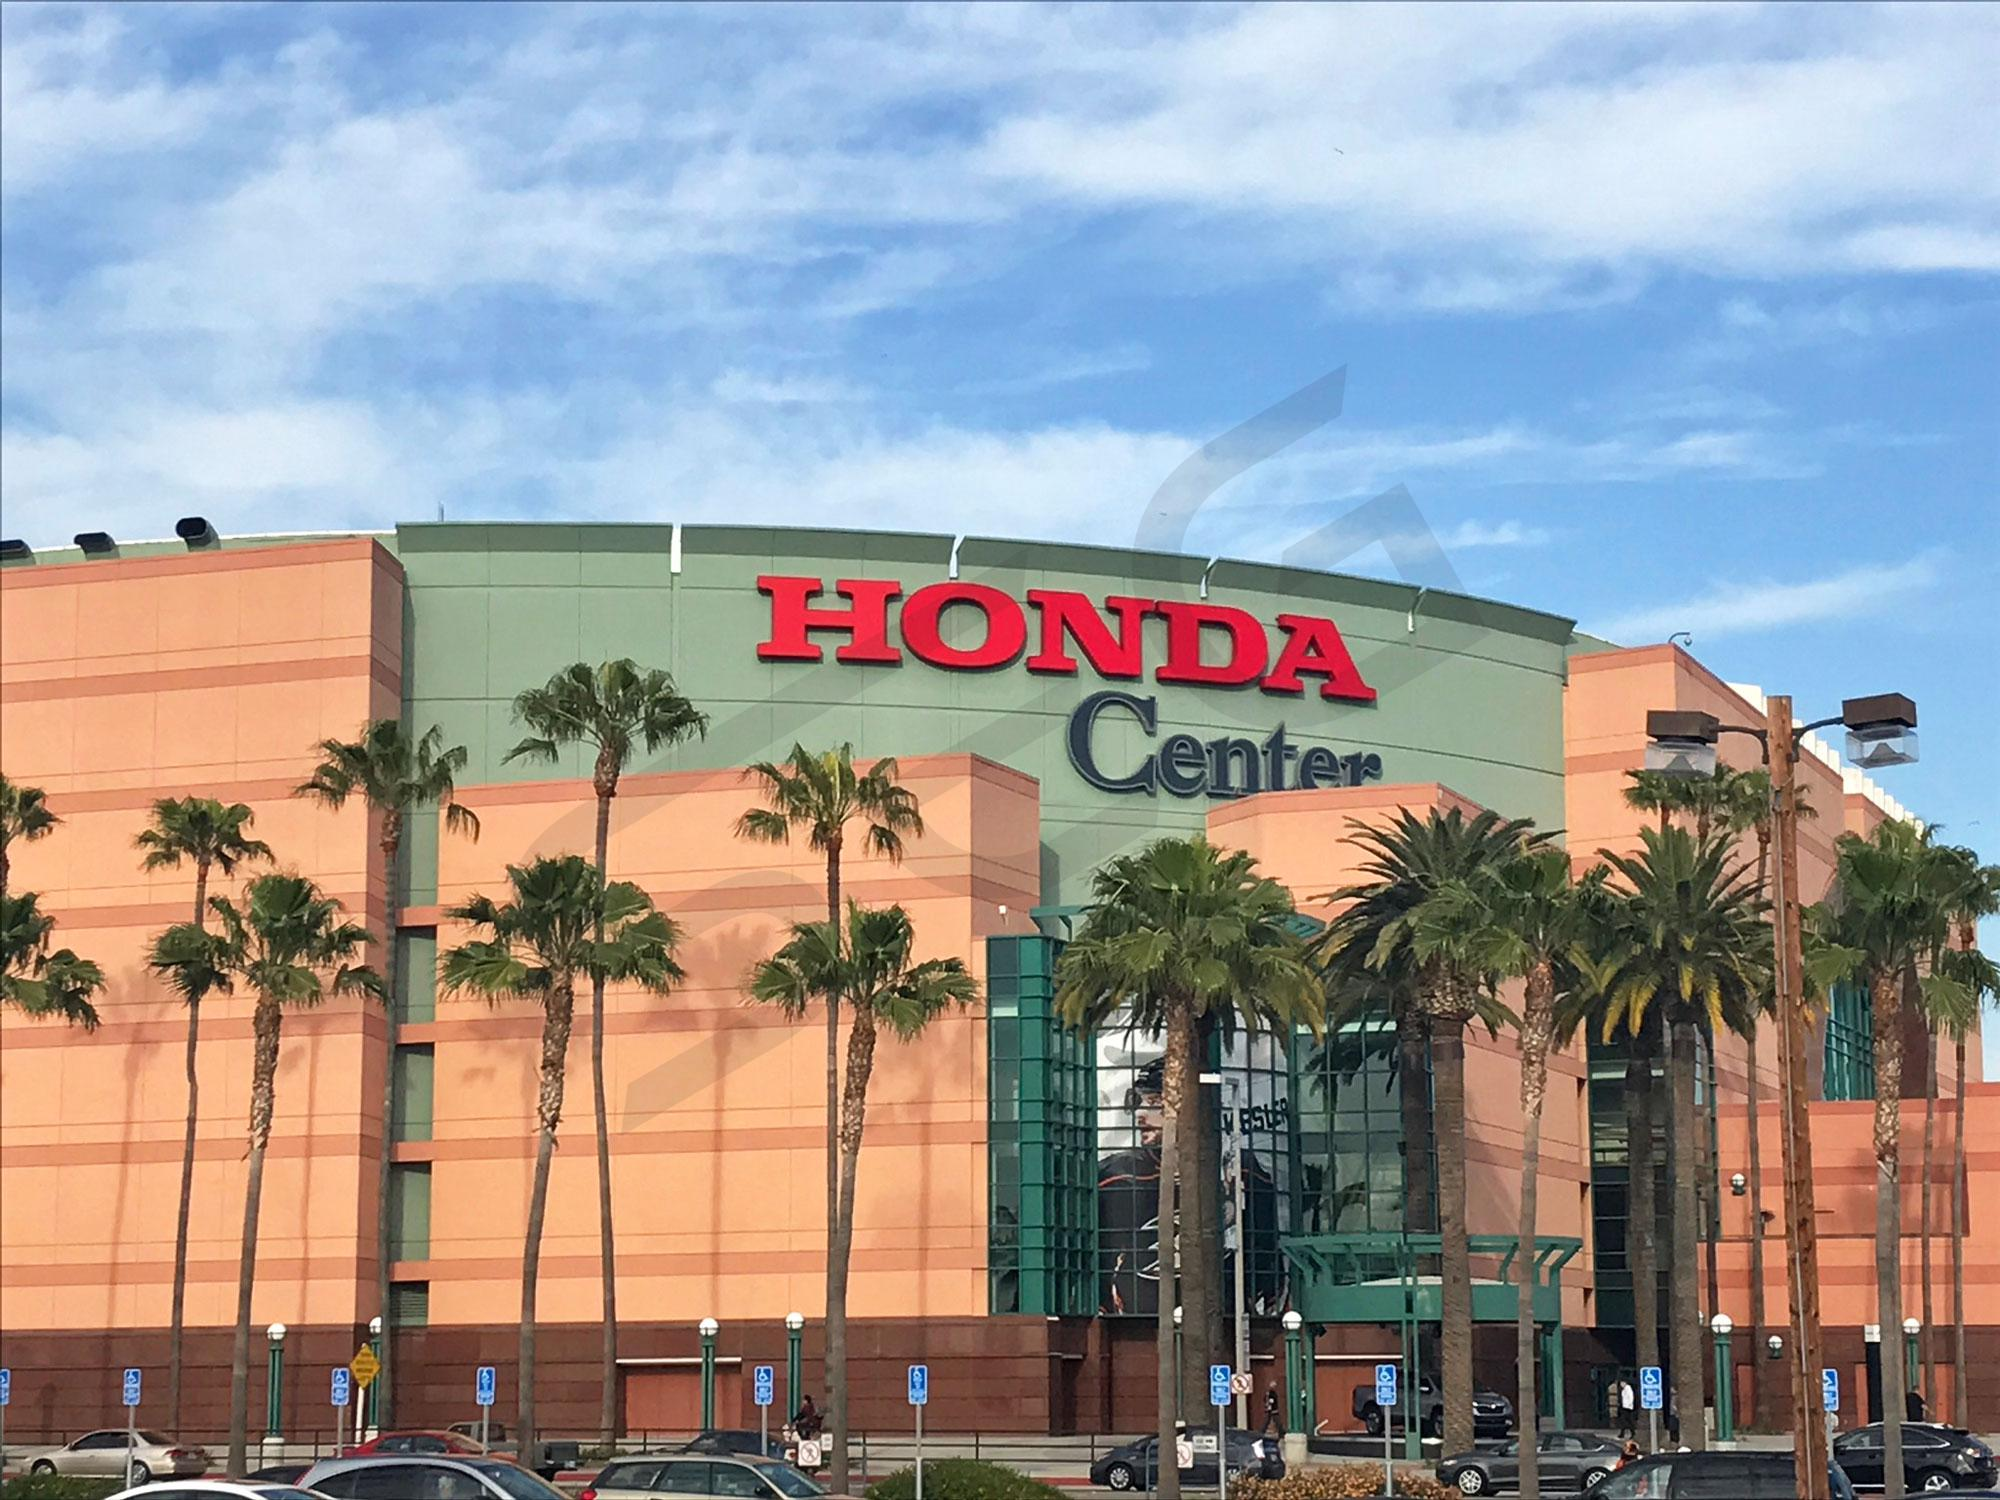 Anaheim Ducks Suite Rentals | Honda Center | Suite ...